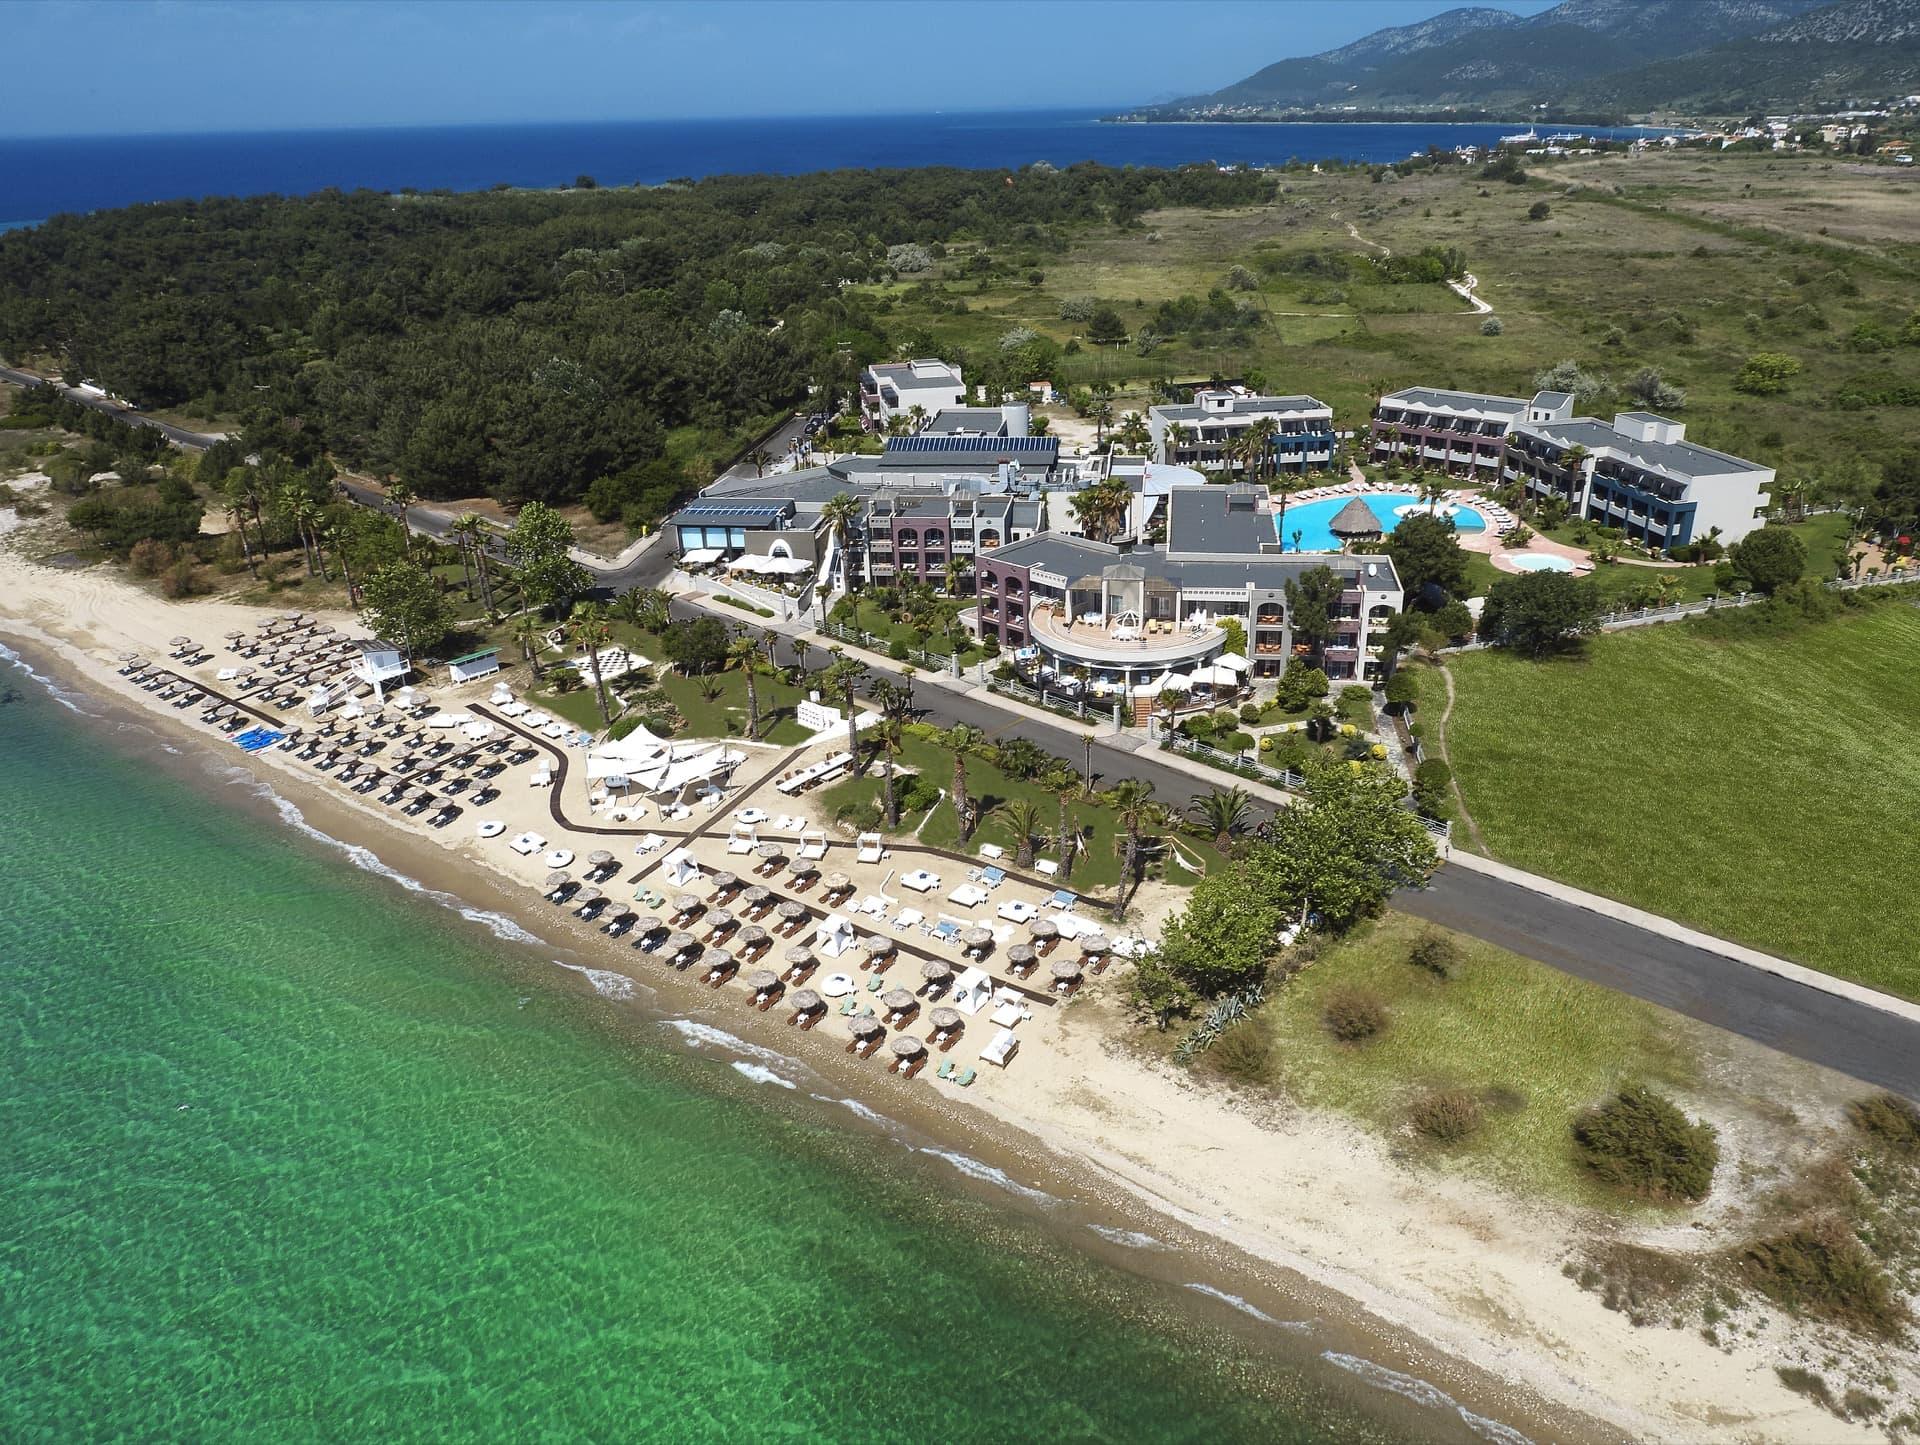 5* Ilio Mare Hotels & Resorts - Θάσος ✦ -40% ✦ 5 Ημέρες (4 Διανυκτερεύσεις) ✦ 2 άτομα + 1 παιδί έως 12 ετών ✦ Ημιδιατροφή ✦ 01/08/2021 έως 23/08/2021 ✦ <strong>Επιπλέον 1 Διανυκτέρευση ΔΩΡΟ και κέρδος 15% σε go4more πόντους!</strong>